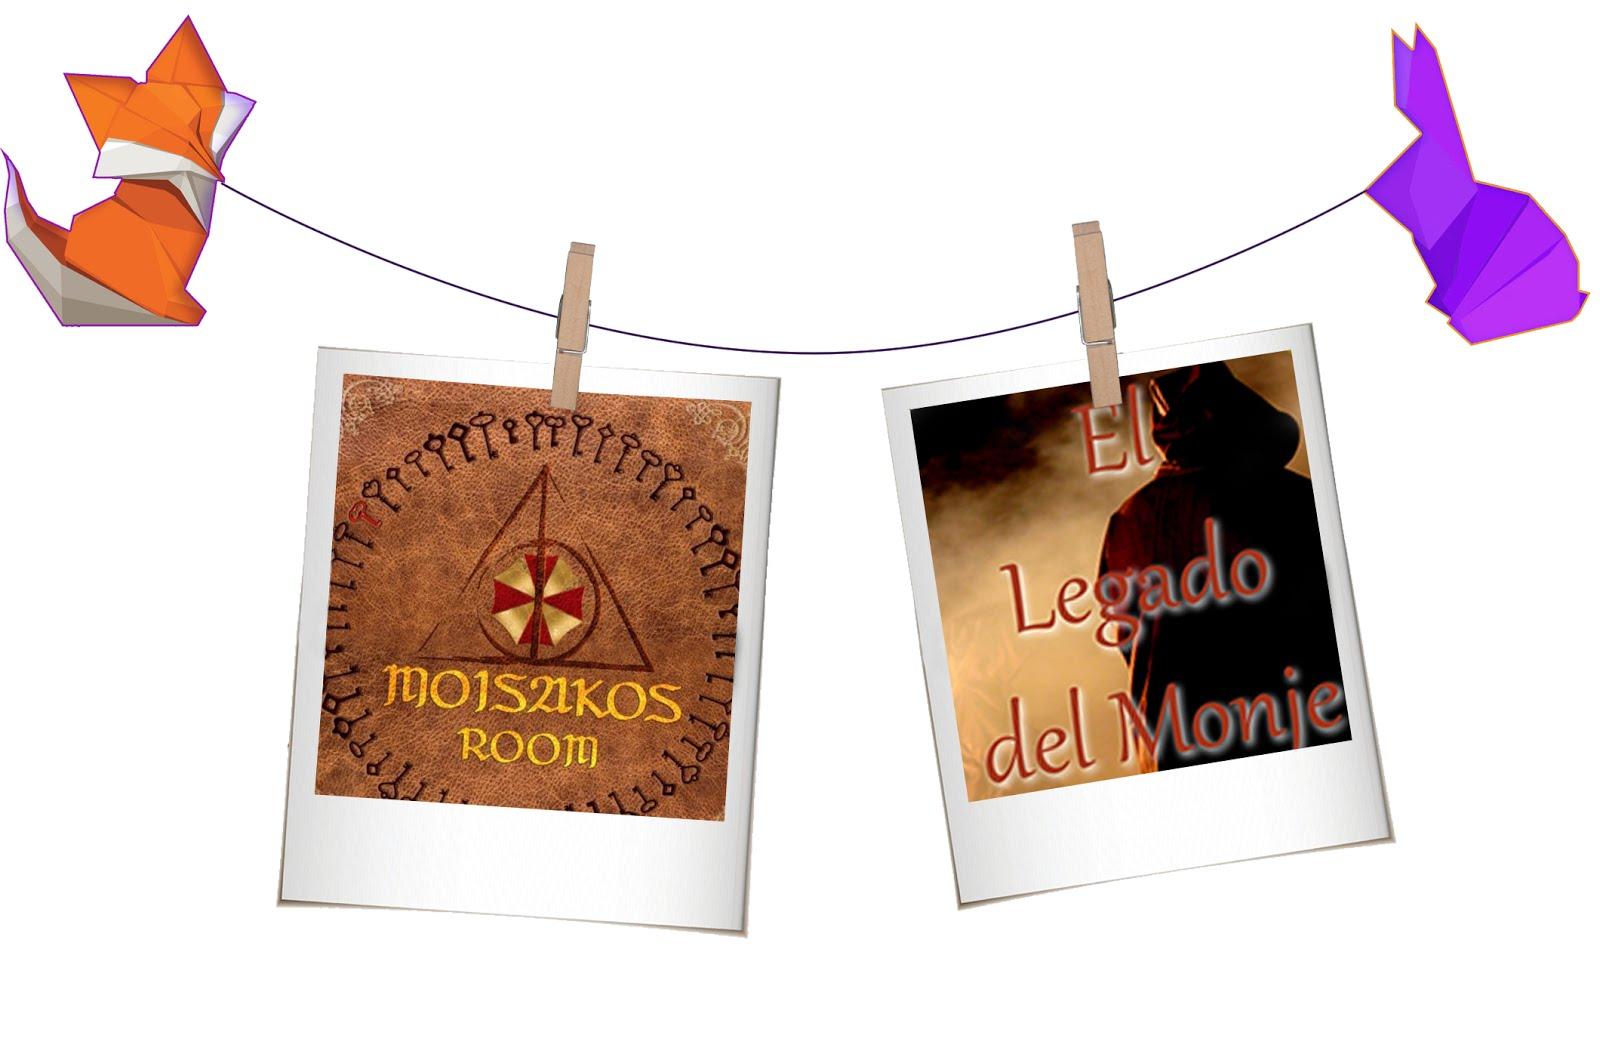 "Moisakos Room ""El Legado del Monje"" (Cádiz)"